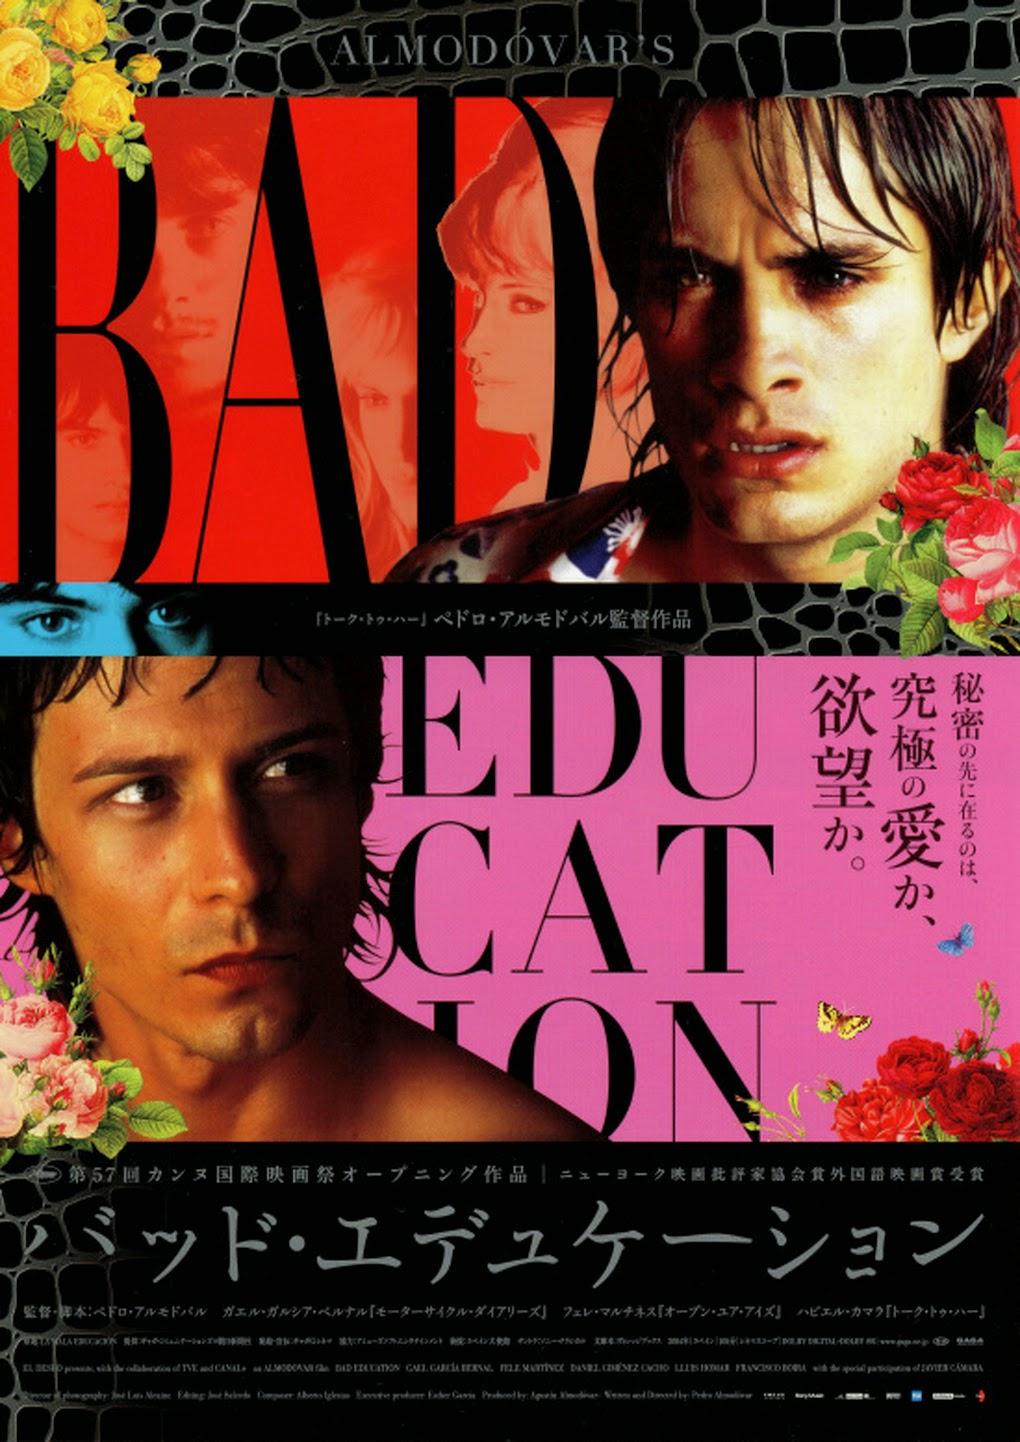 Pedro Almodvars Posters Are As Sumptuous His Films Short Circuit 2 27x40 Movie Poster 1988 Bad Education Japanese Chirashi 2005 Gaga Communication 7 X 10